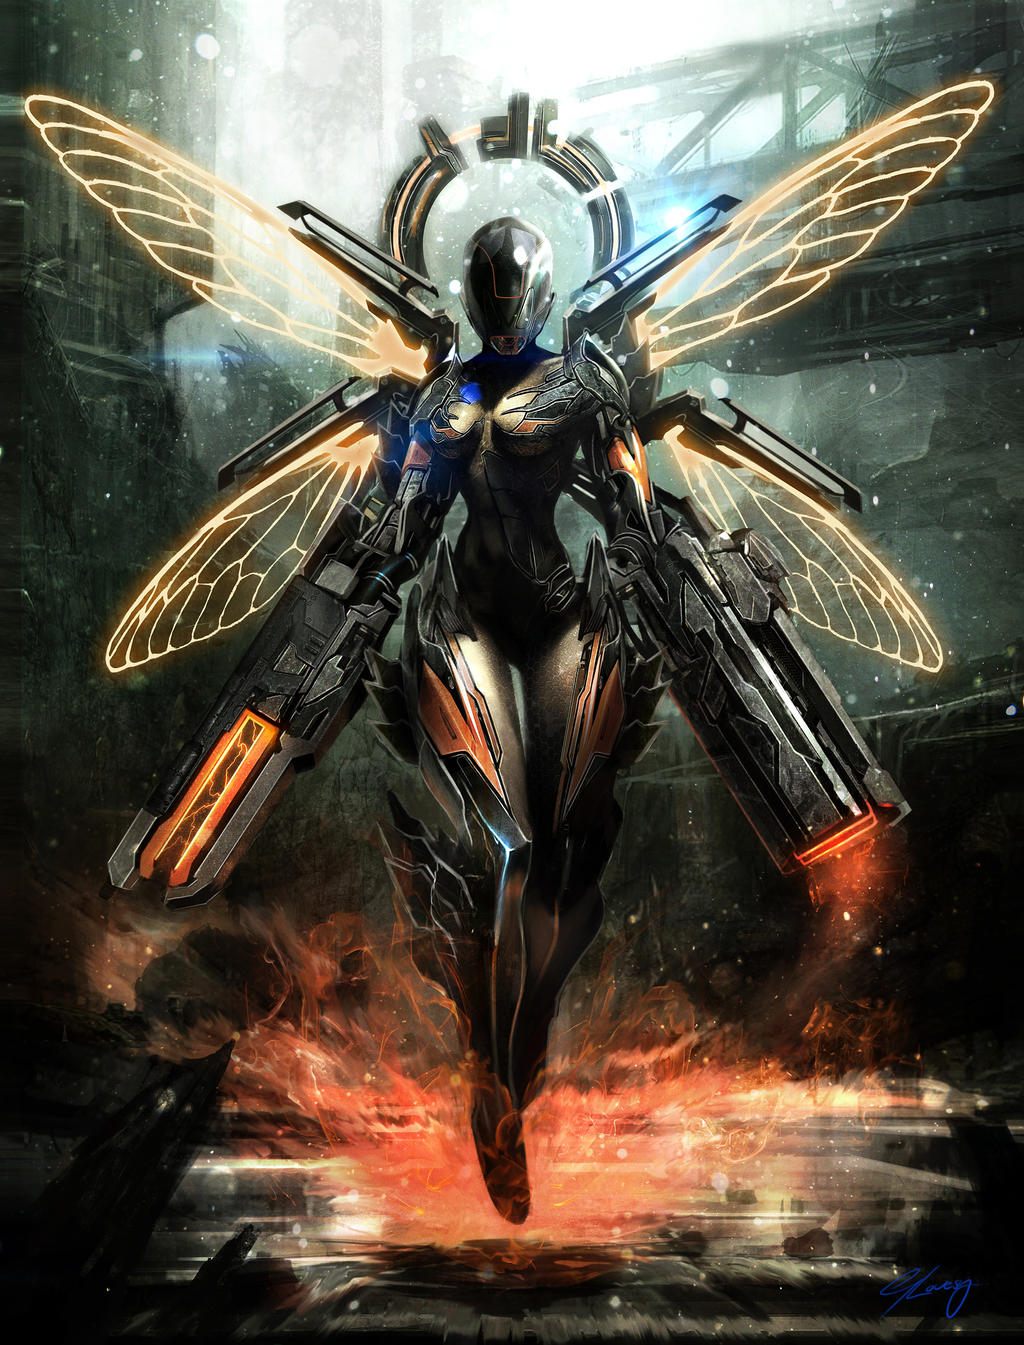 the war fairy by georgelovesyart on deviantart